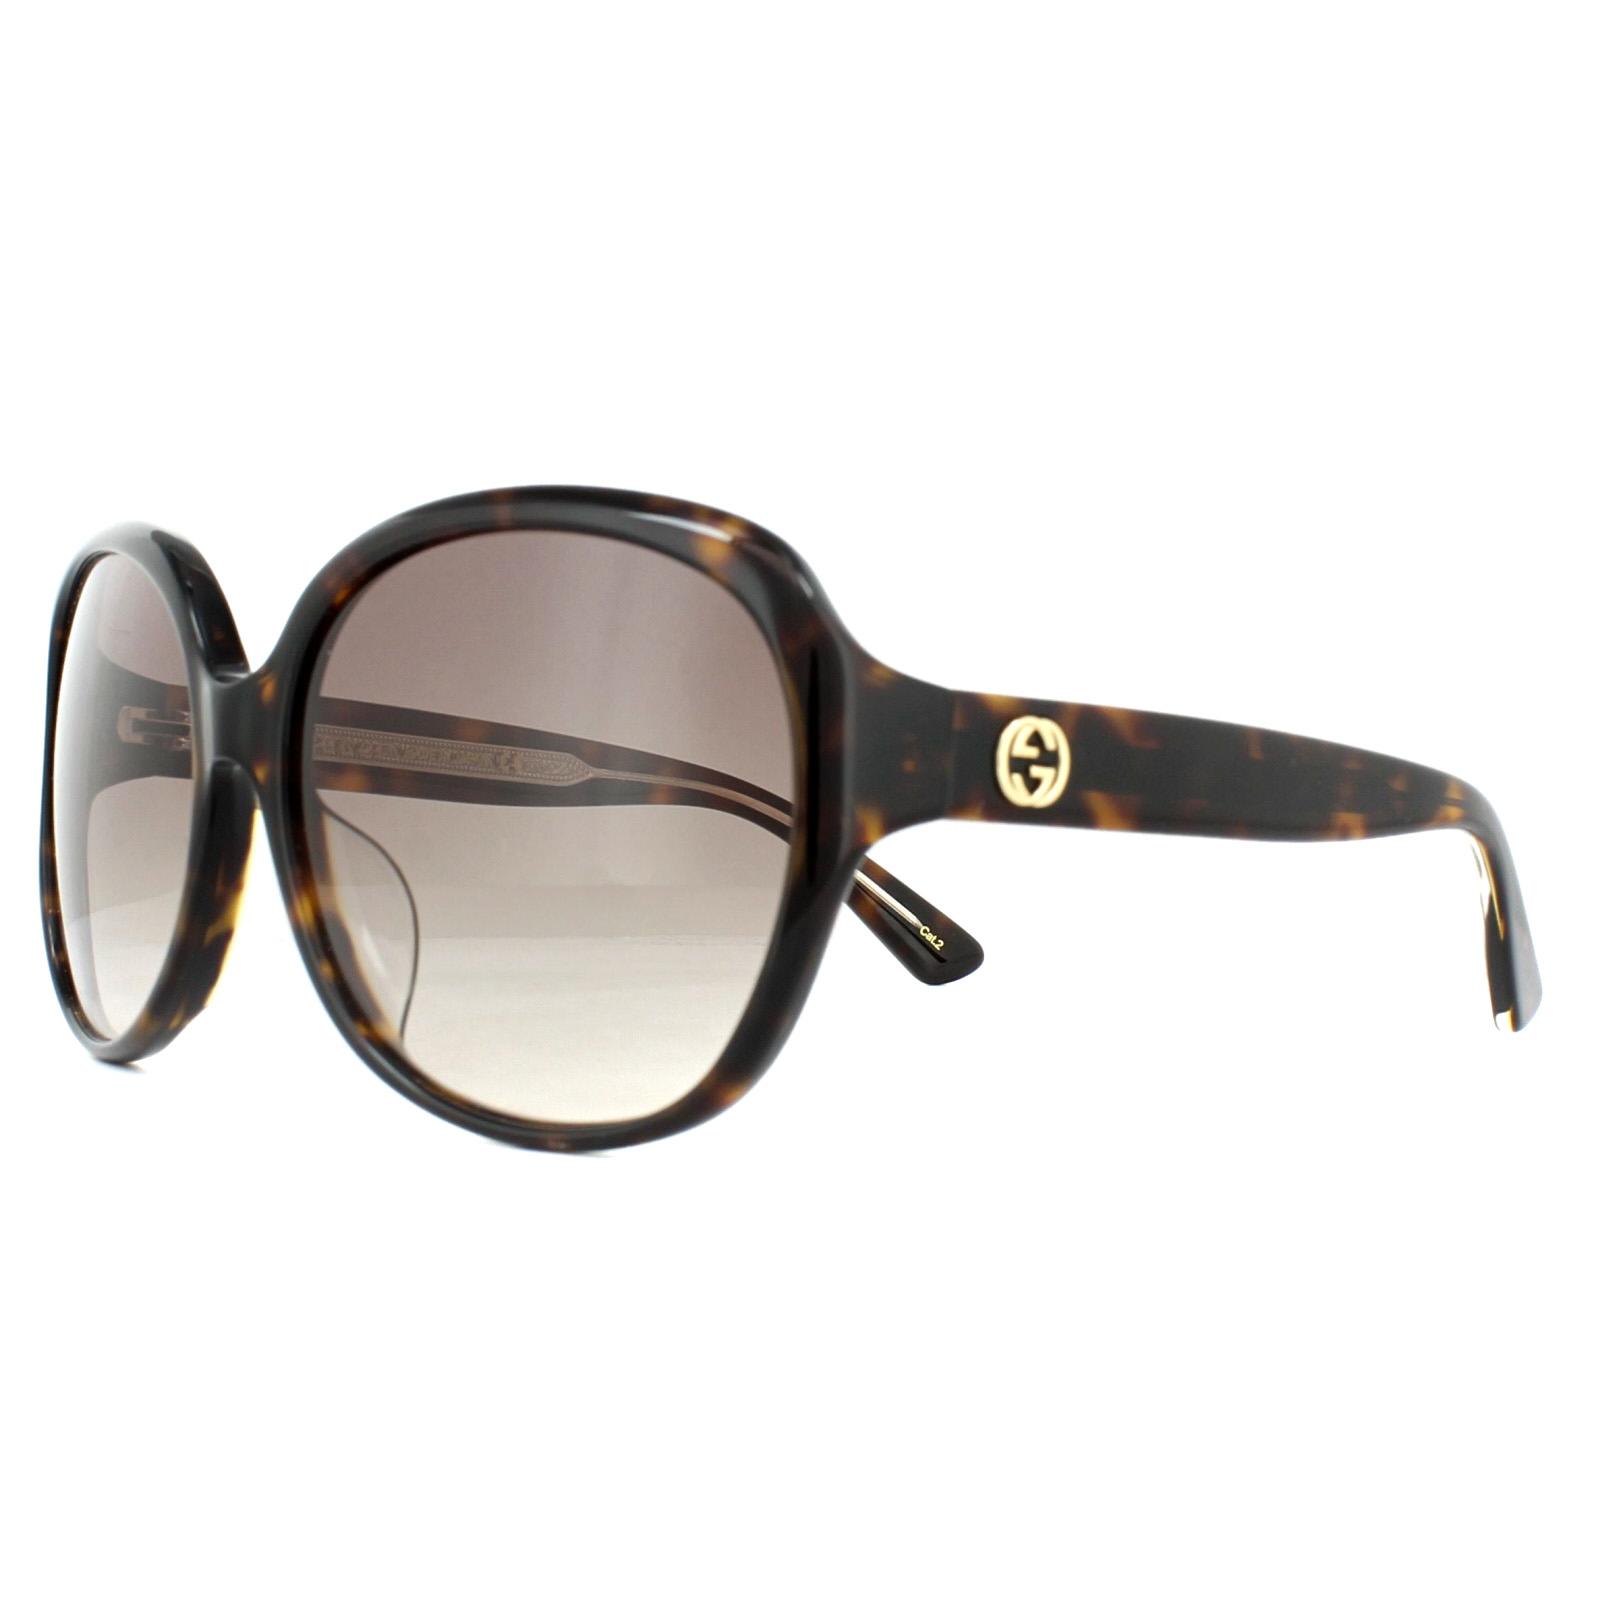 6752d9b80cc0 Gucci Sunglasses GG0080SK 003 Tortoise Brown Gradient 889652052038 ...